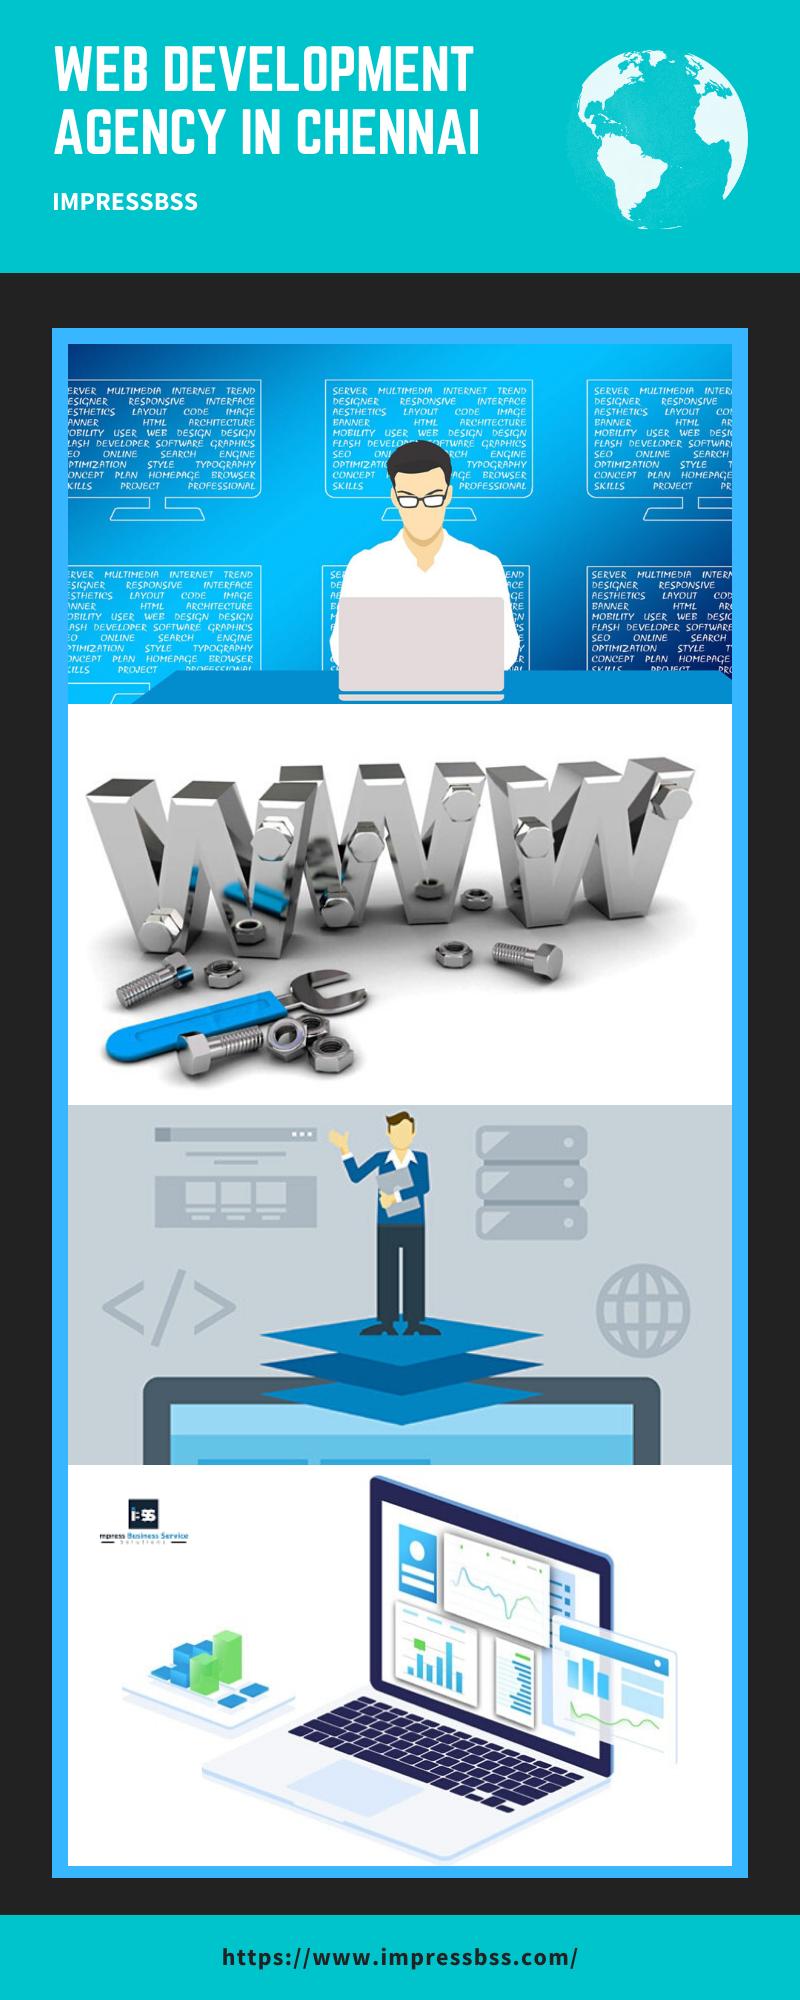 Web Development Agency In Chennai Web Development Design Web Design Company Web Development Agency